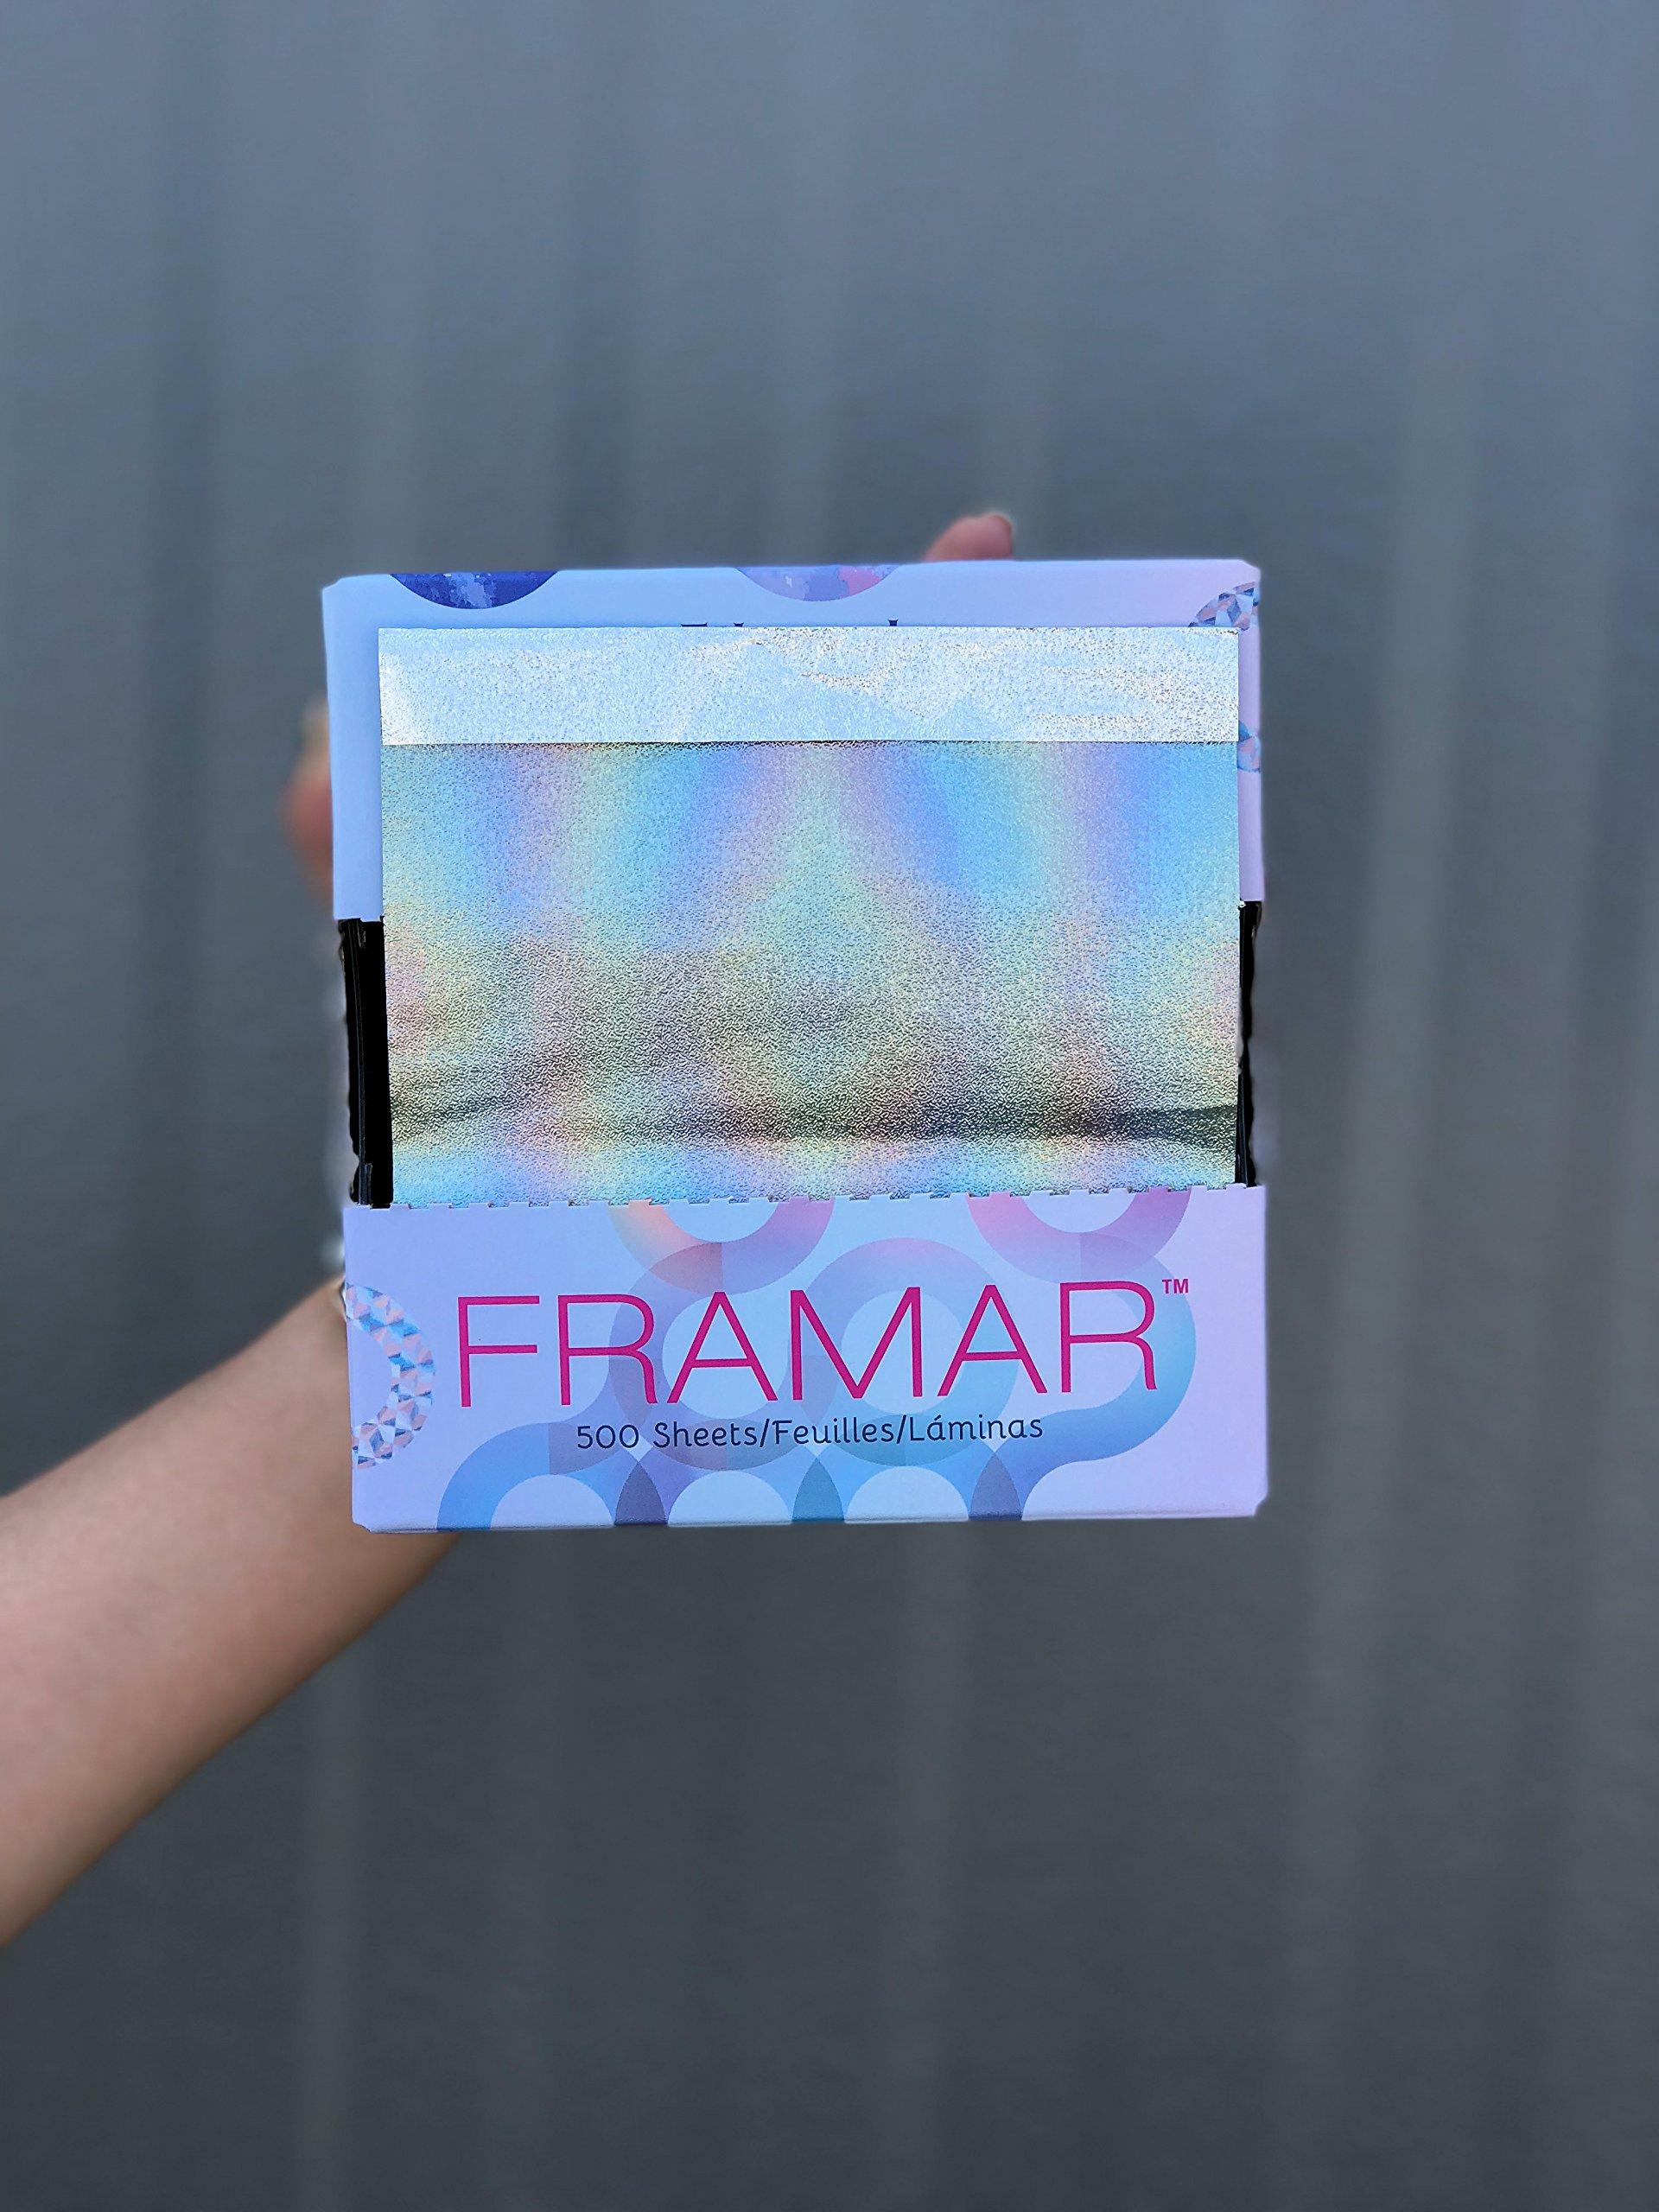 Framar Ethereal Pop Up Foil 5x11-500 Count by Framar (Image #8)